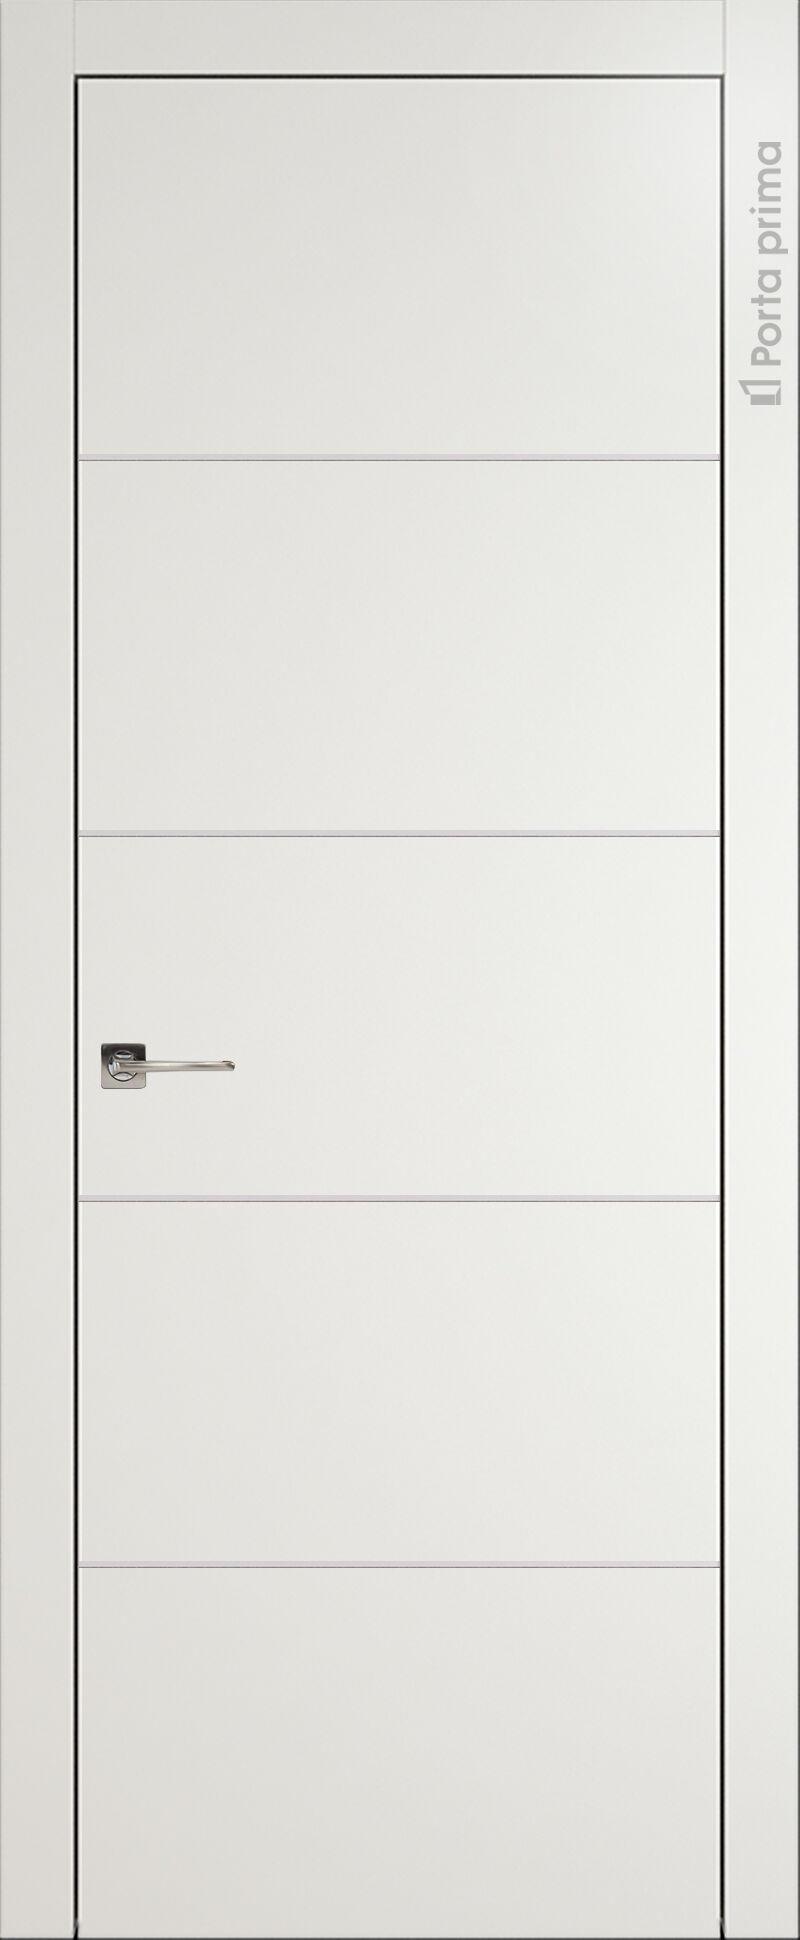 Tivoli Д-3 цвет - Бежевая эмаль (RAL 9010) Без стекла (ДГ)